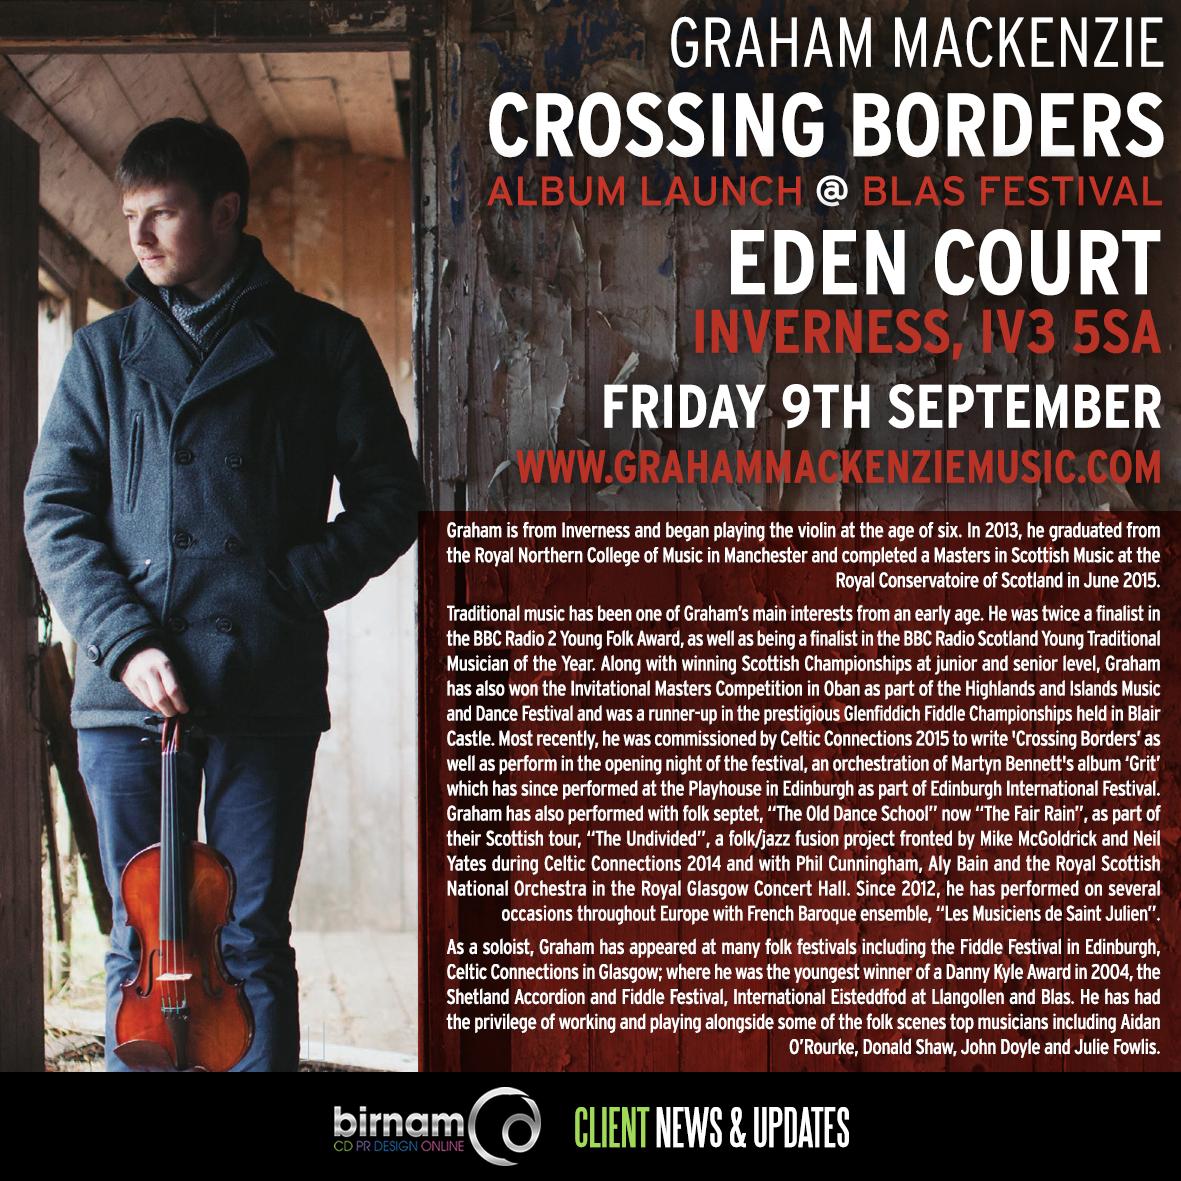 Graham Mackenzie launches his debut album tomorrow night at Blas Festival. The concert will be at Eden Court in Inverness.   www.grahammackenziemusic.com | www.blas-festival.com